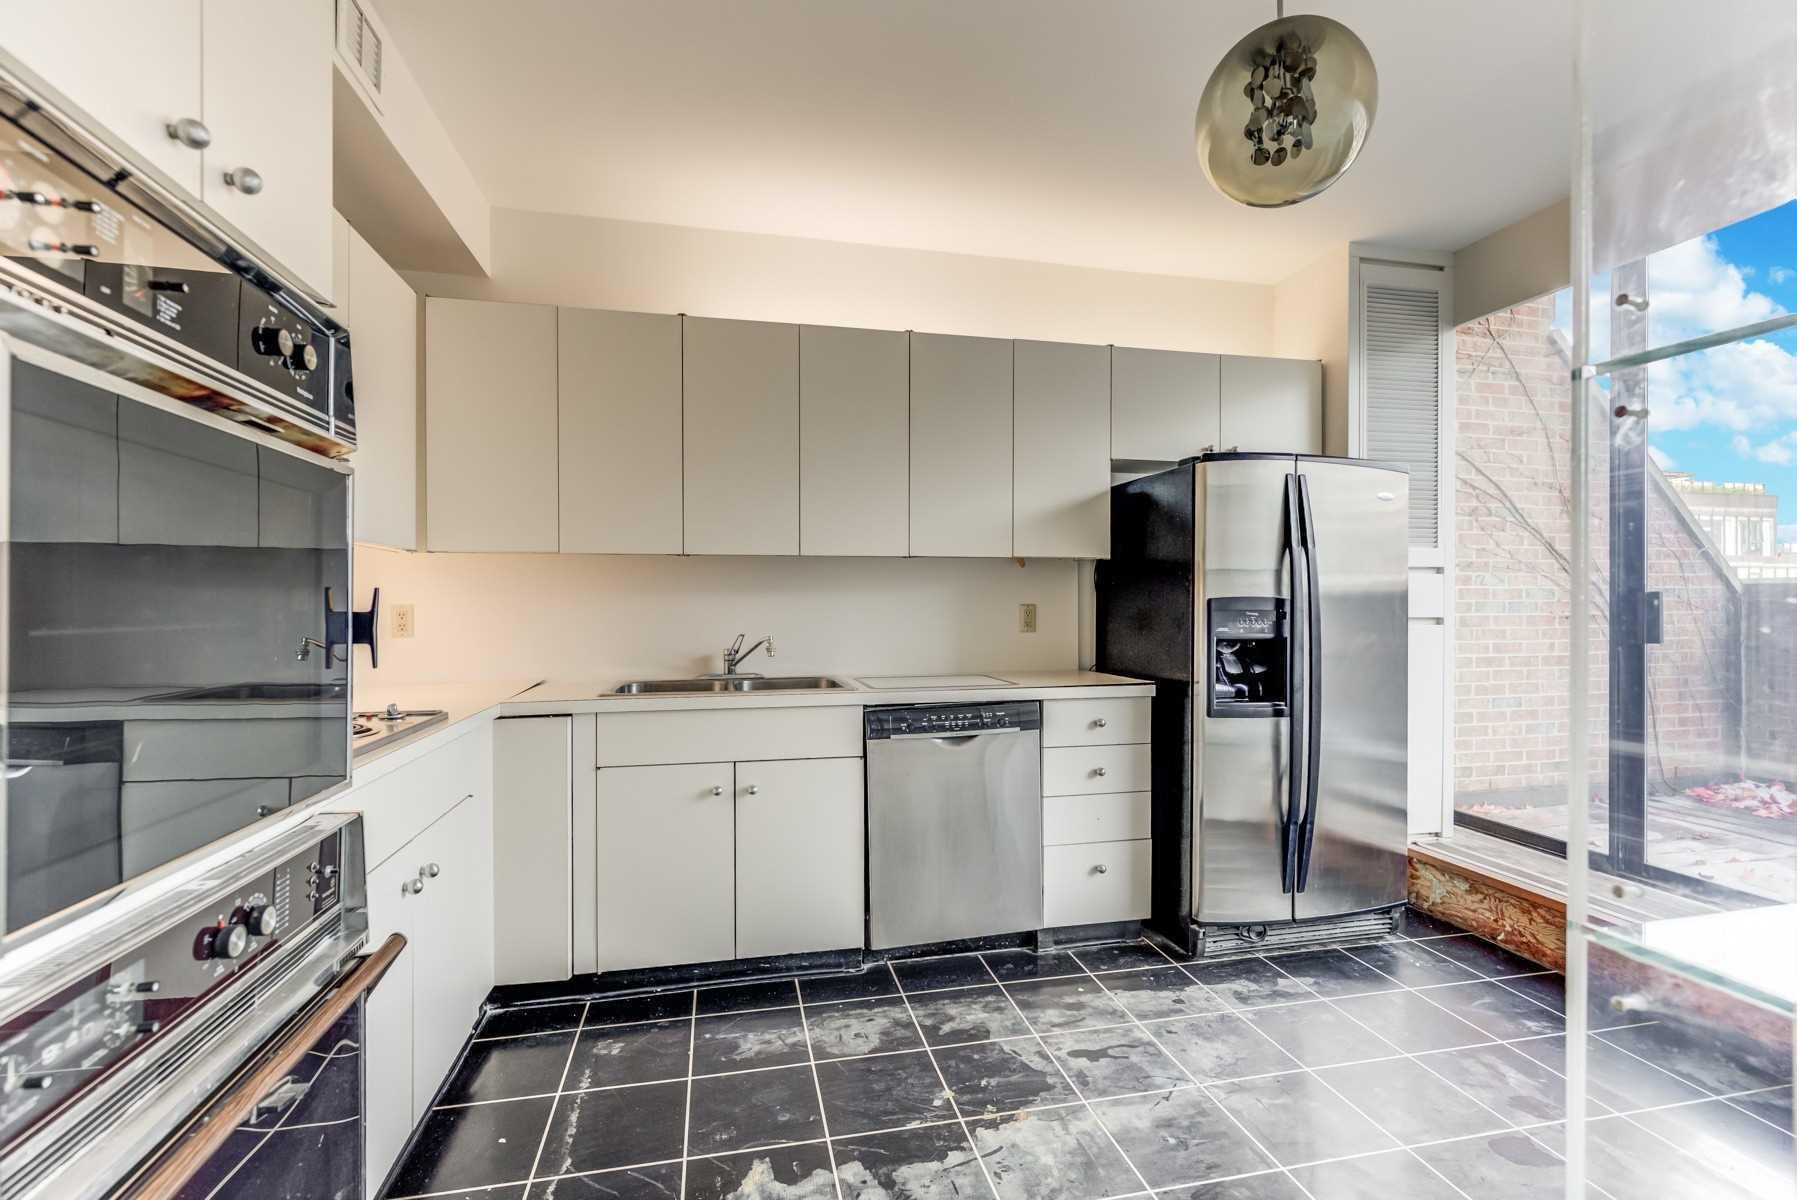 607 - 55A Avenue Rd - Annex Condo Apt for sale, 2 Bedrooms (C5185690) - #18